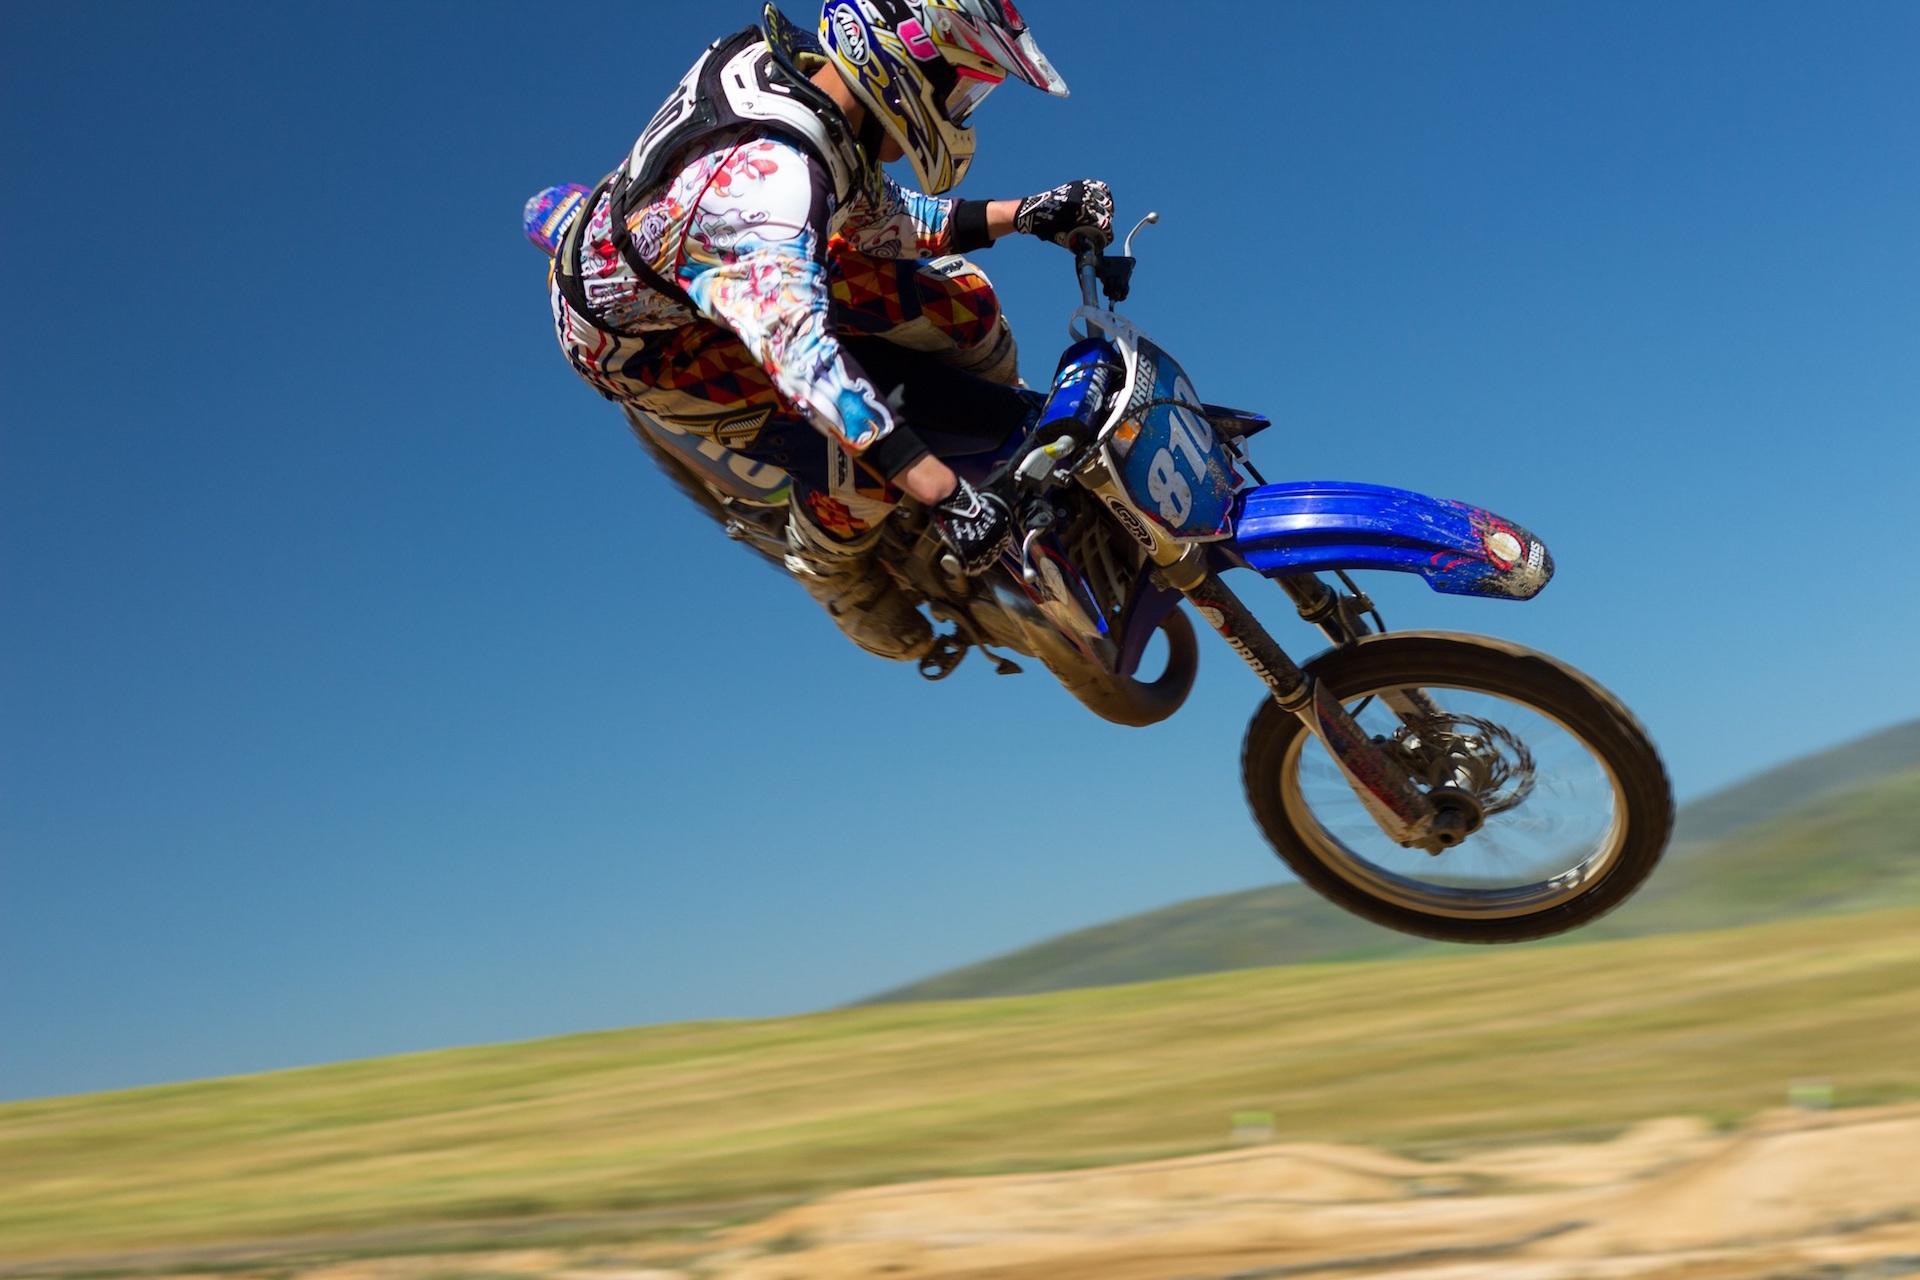 motocicleta, salto, carrera, riesgo, competición - Fondos de Pantalla HD - professor-falken.com